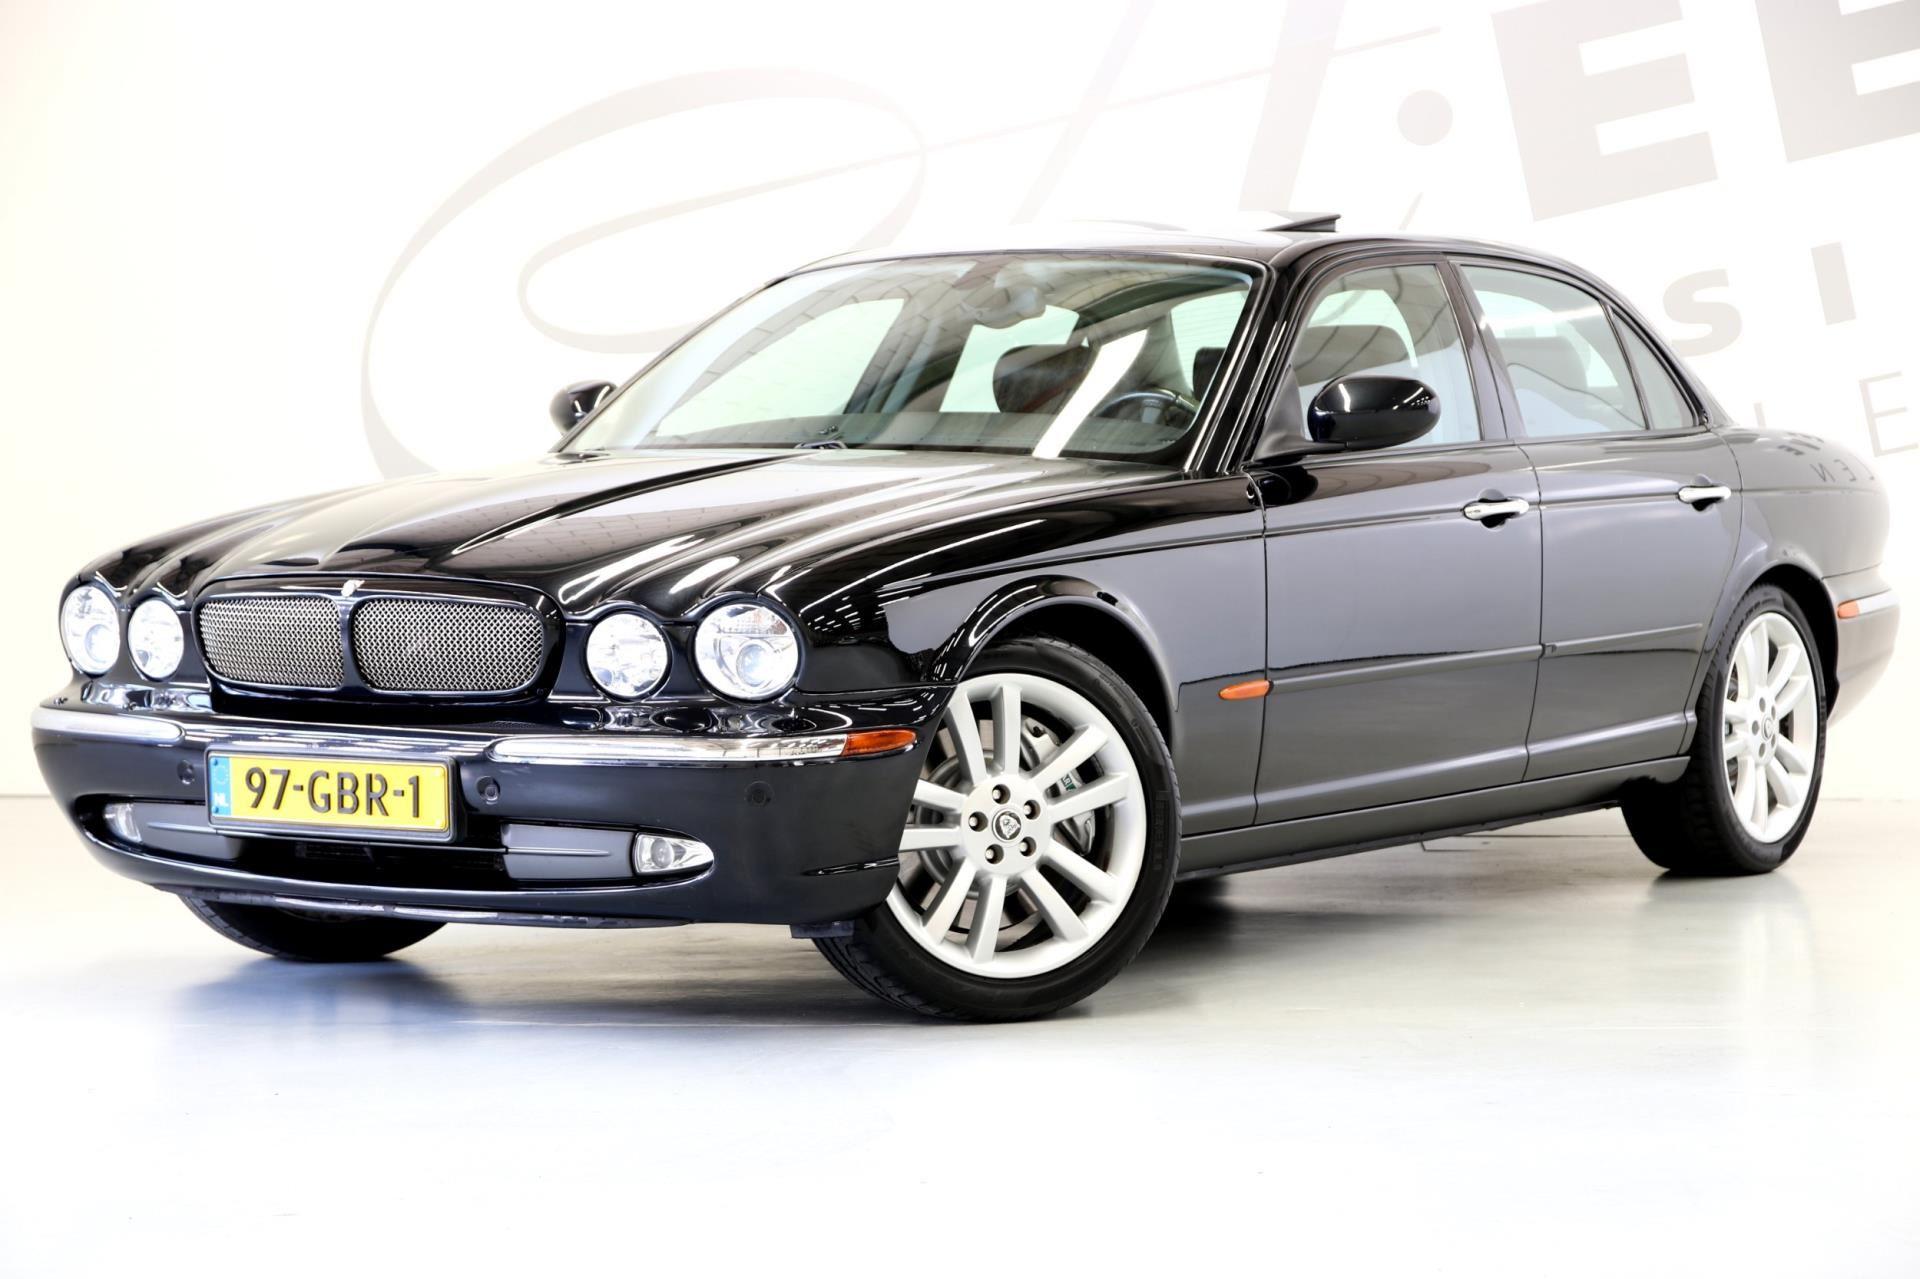 Jaguar XJ/R occasion - Aeen Exclusieve Automobielen